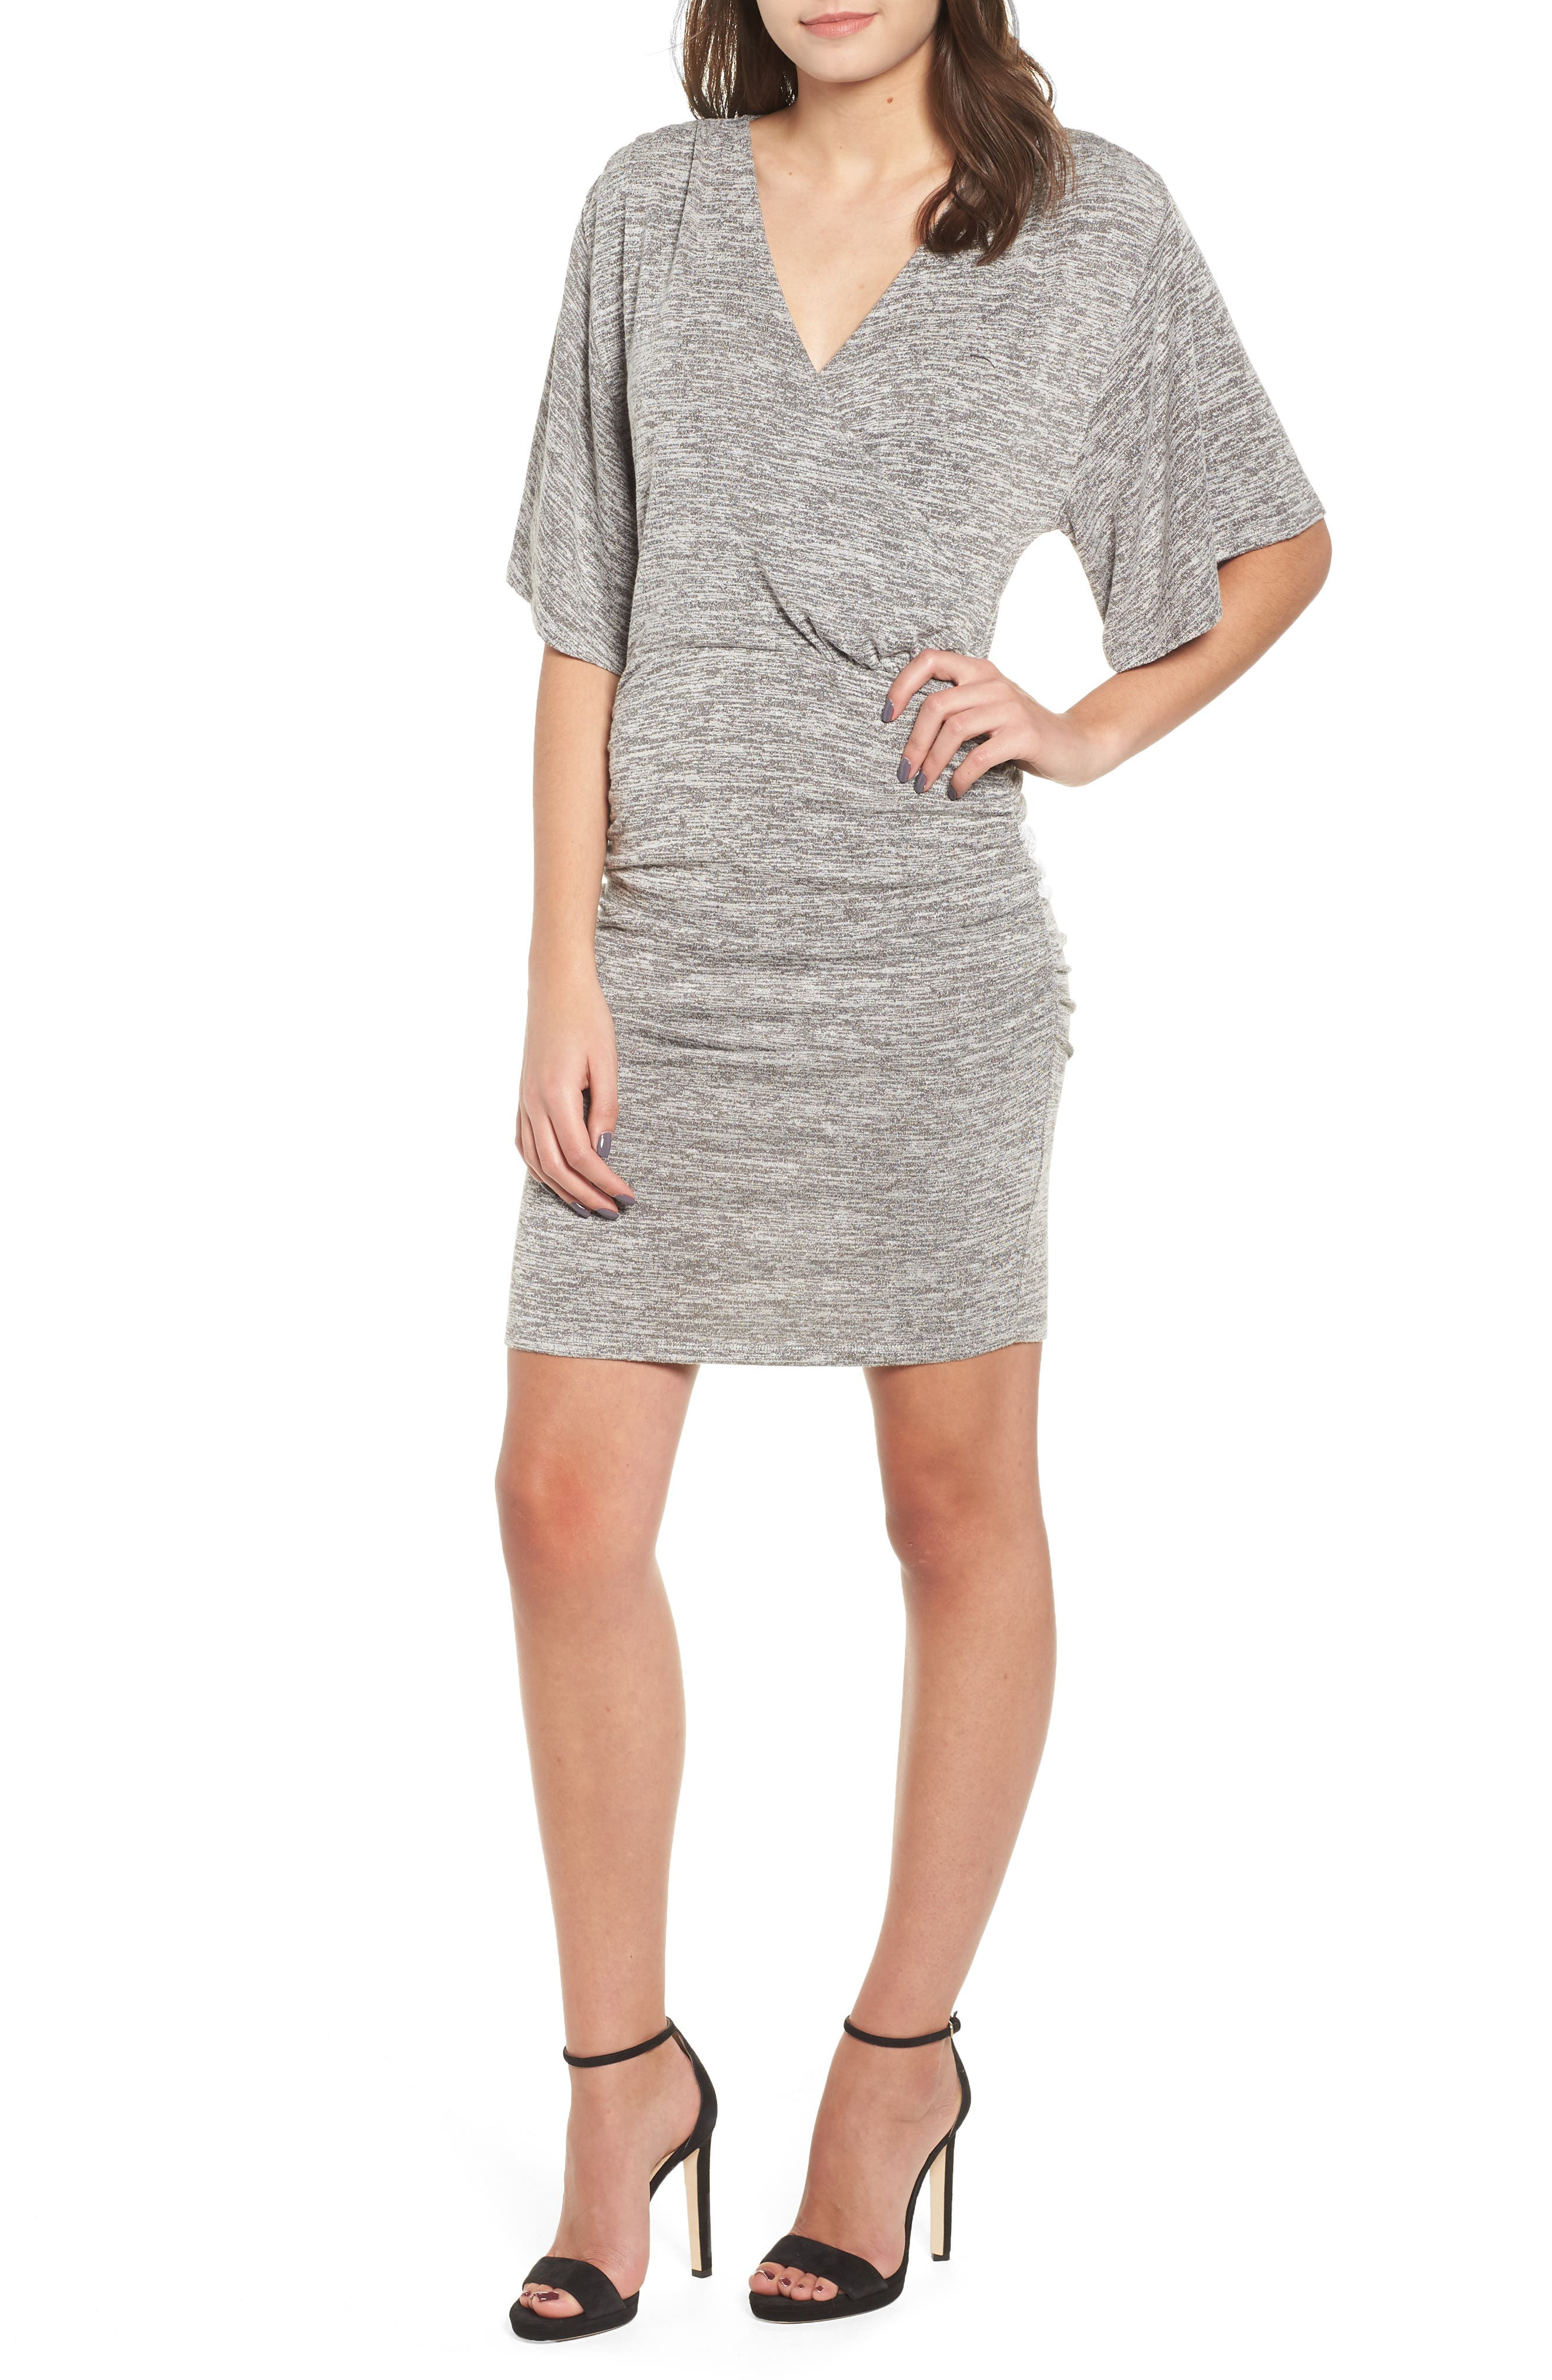 Wrap Dress,                             Main thumbnail 1, color,                             GREY CLOUDY HEATHER